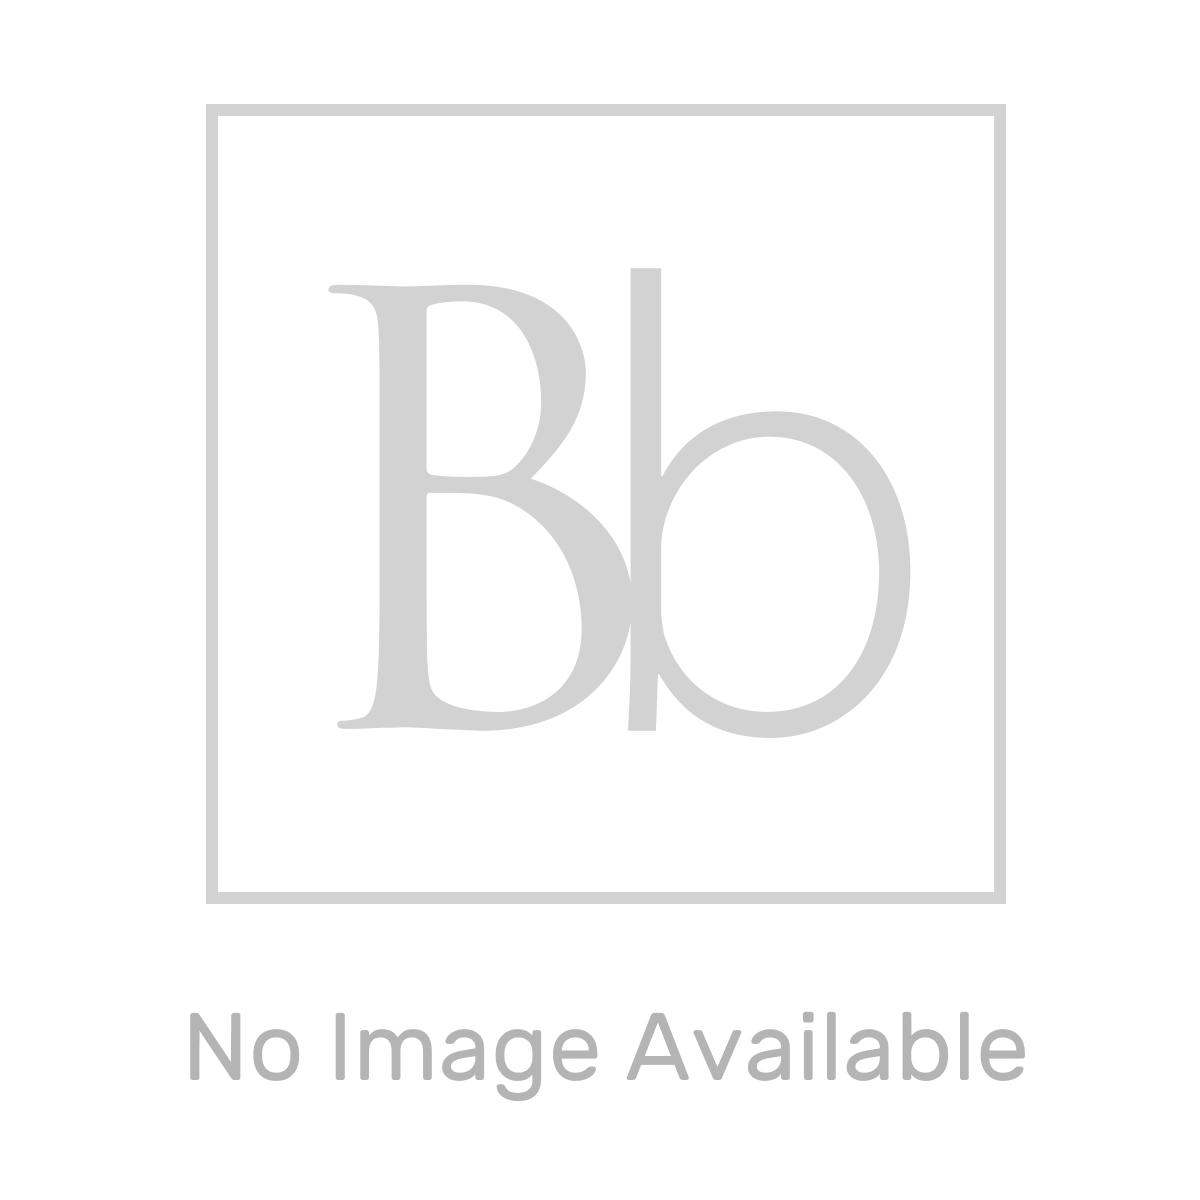 April Identiti 8 Framed Black Matrix Wet Room Shower Enclosure